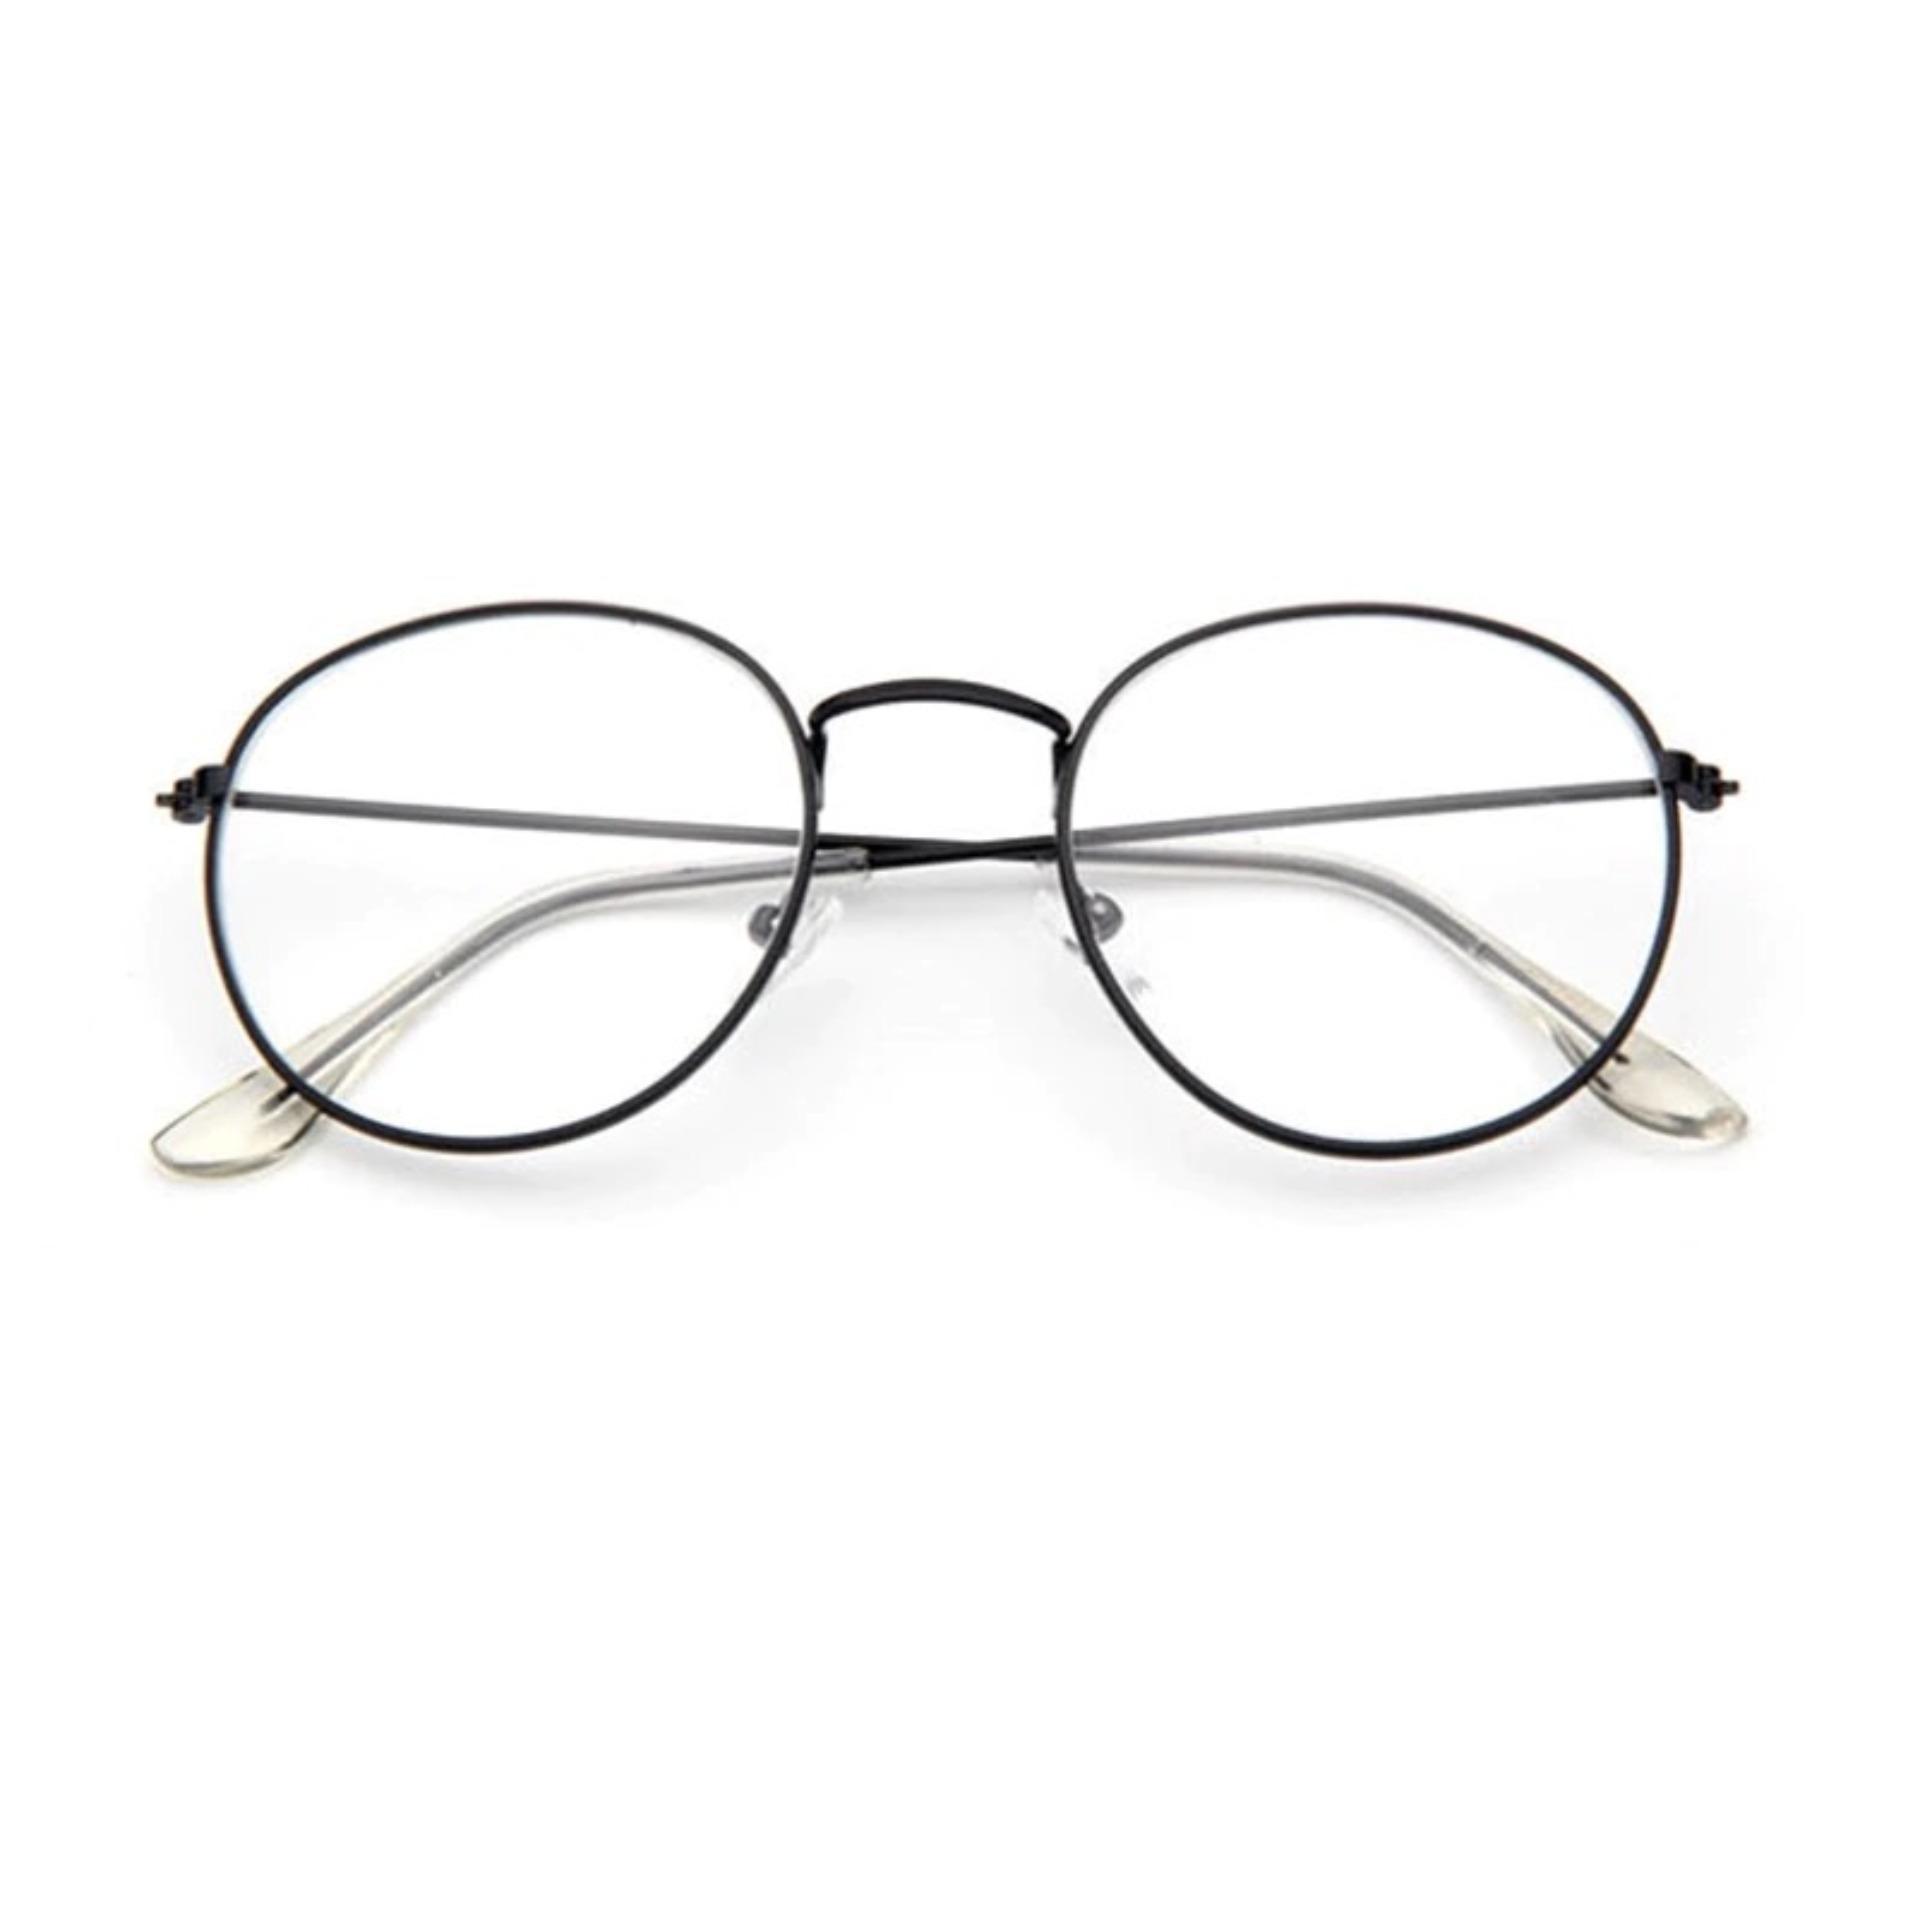 Vintage Fashion Sunglasses MN1000 - Kacamata wanita - Sabyan - nissa -  Populer bd7a6485cf